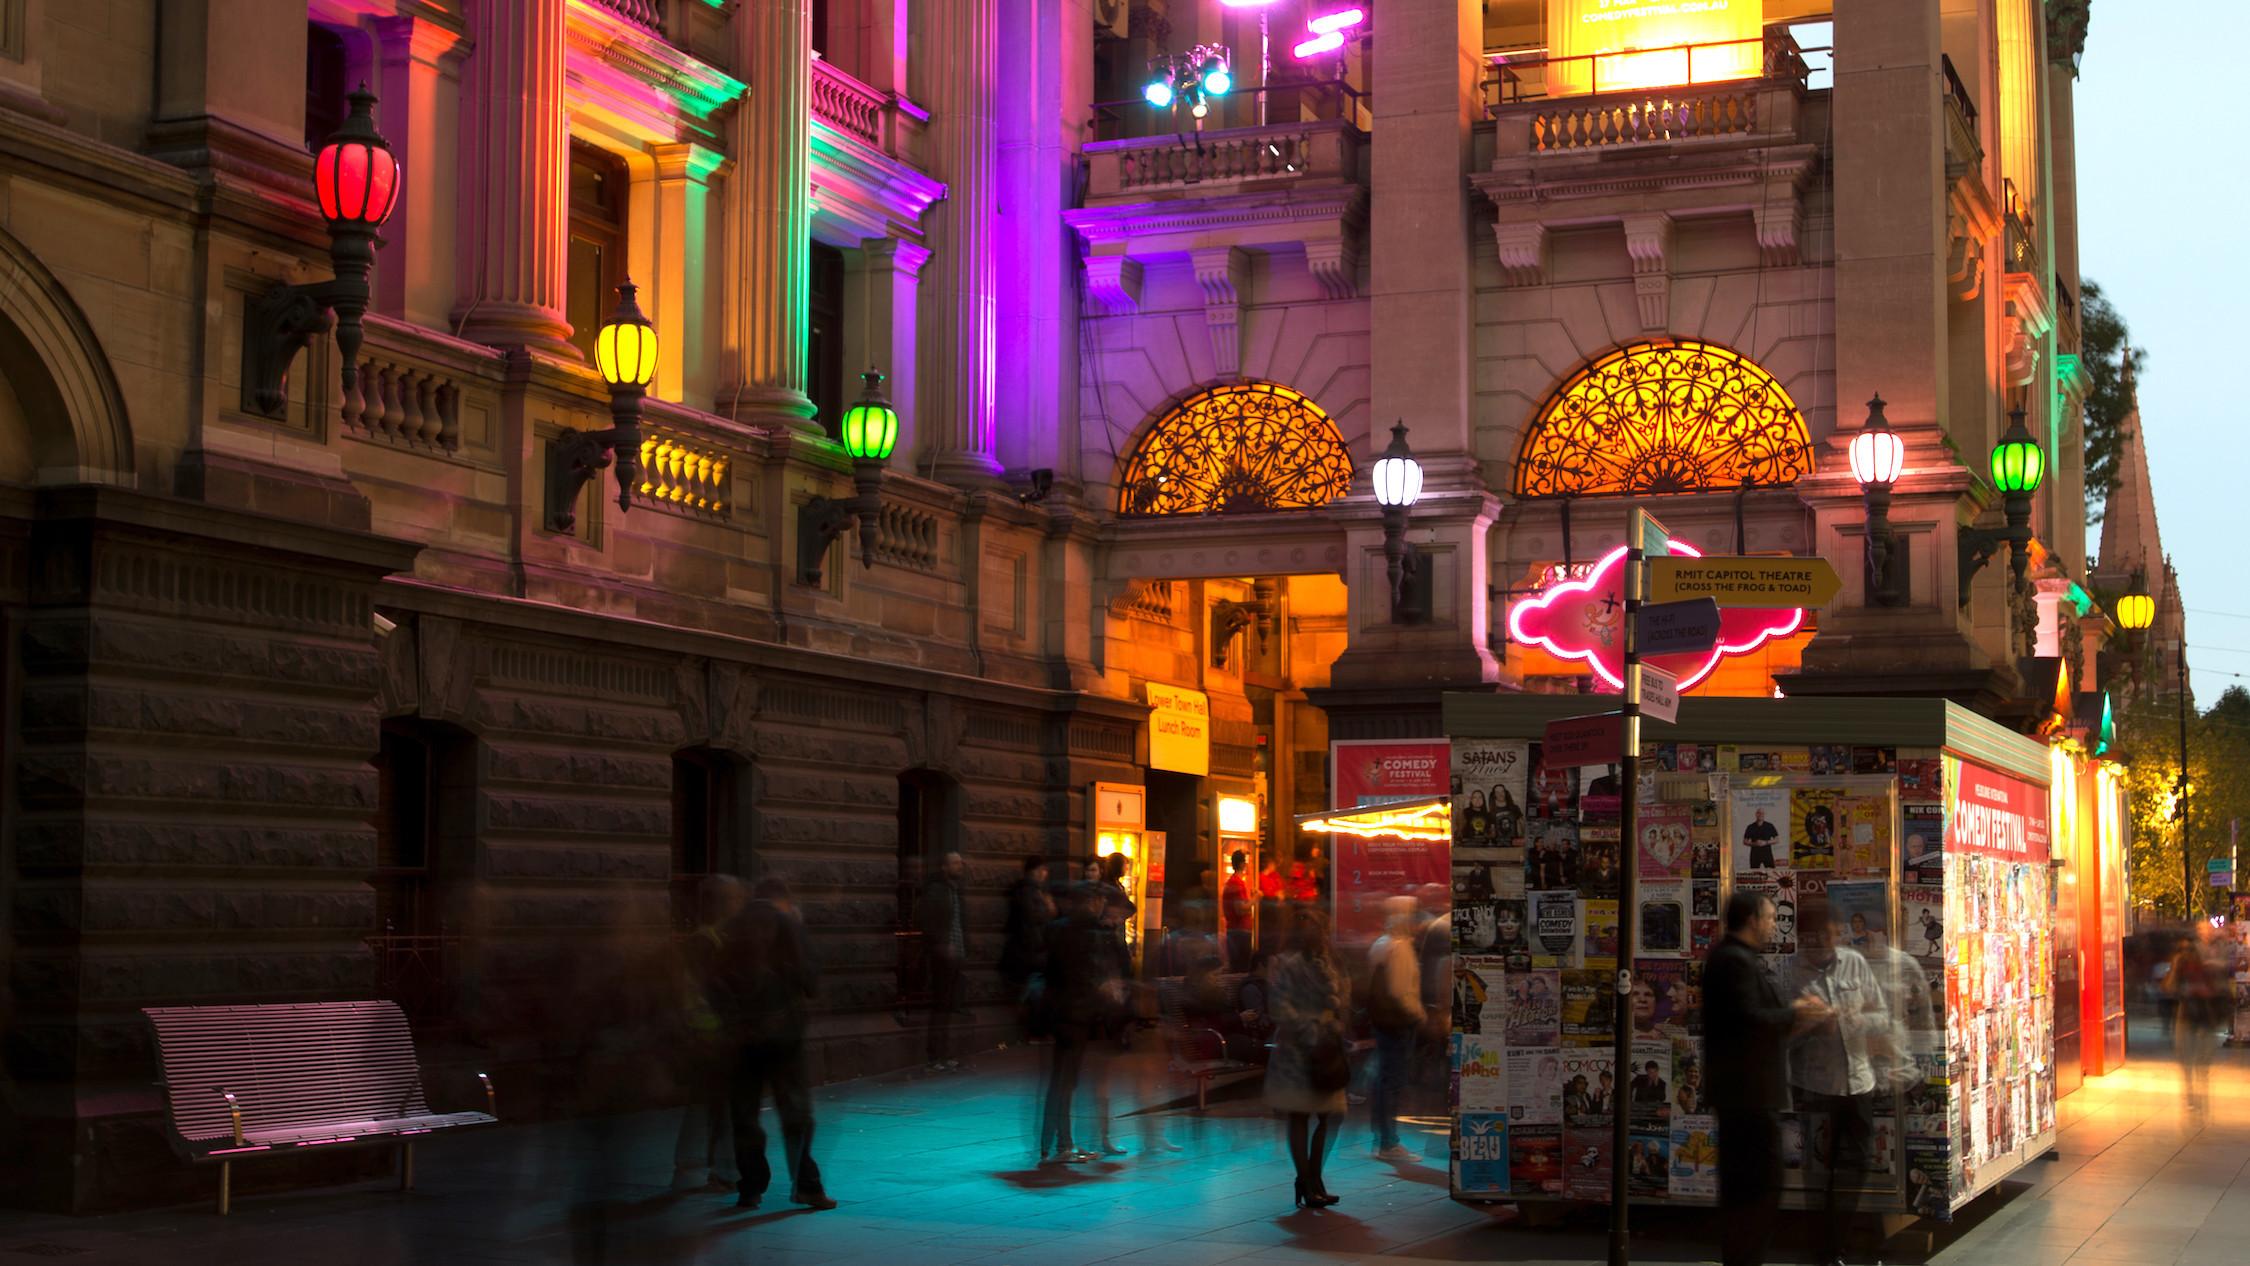 Lets Get Funny at the Brunny - Những sự kiện miễn phí ở Melbourne trong tháng 5